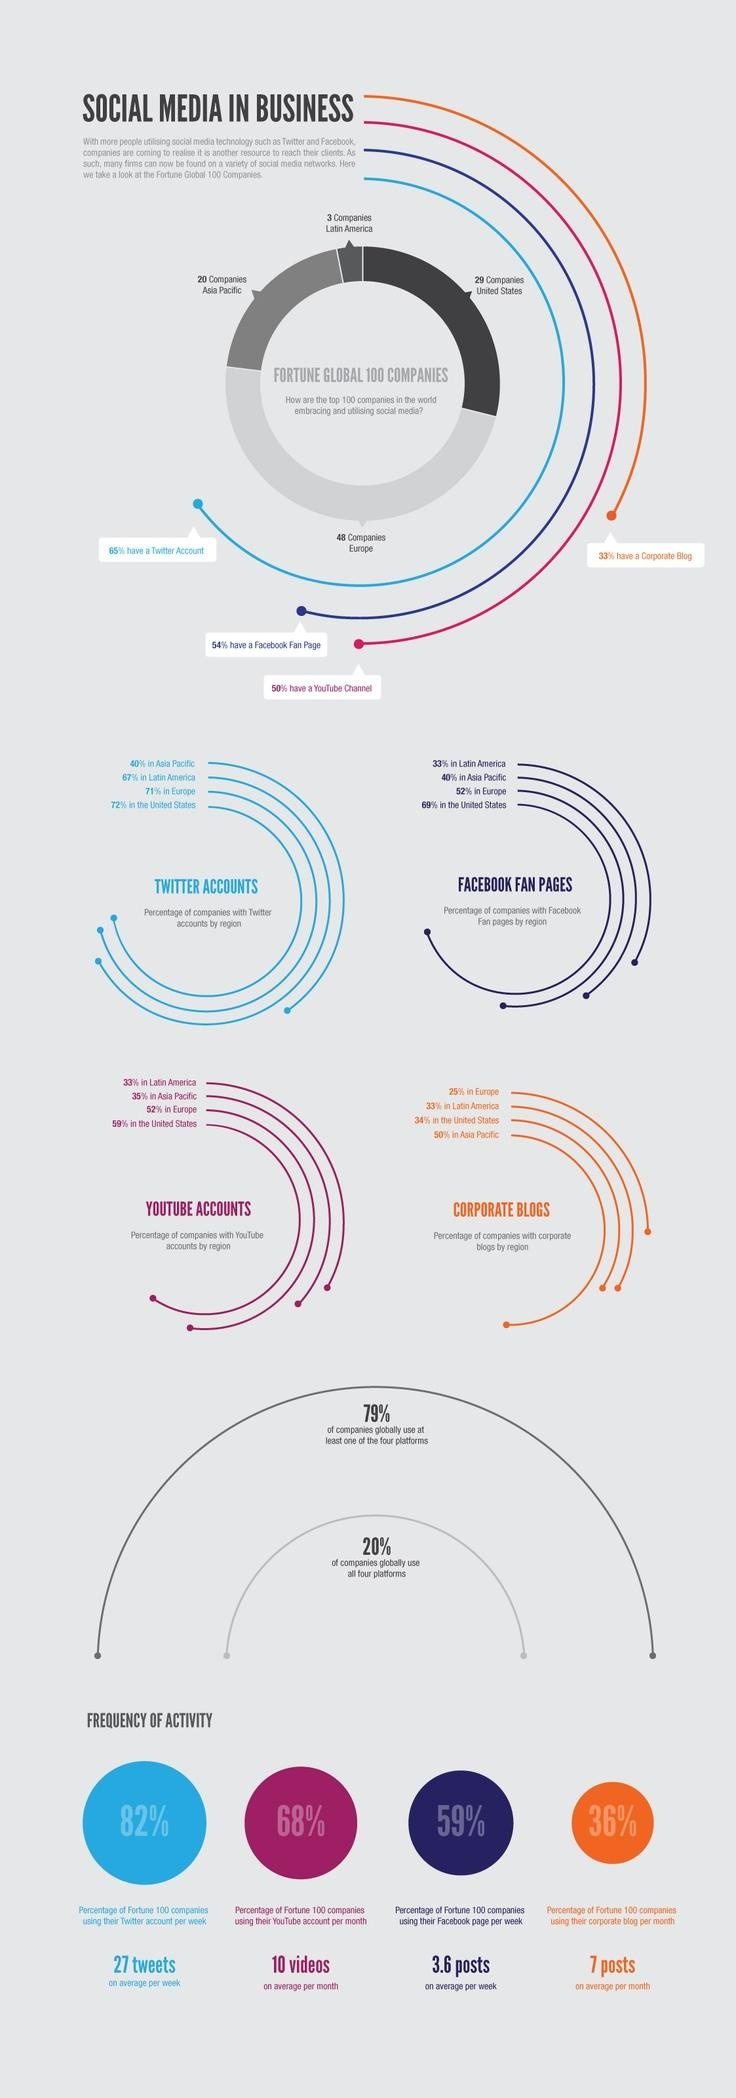 #Infograpic - #SocialMedia in Business     Get more Vine followers at http://VineFollowers.me